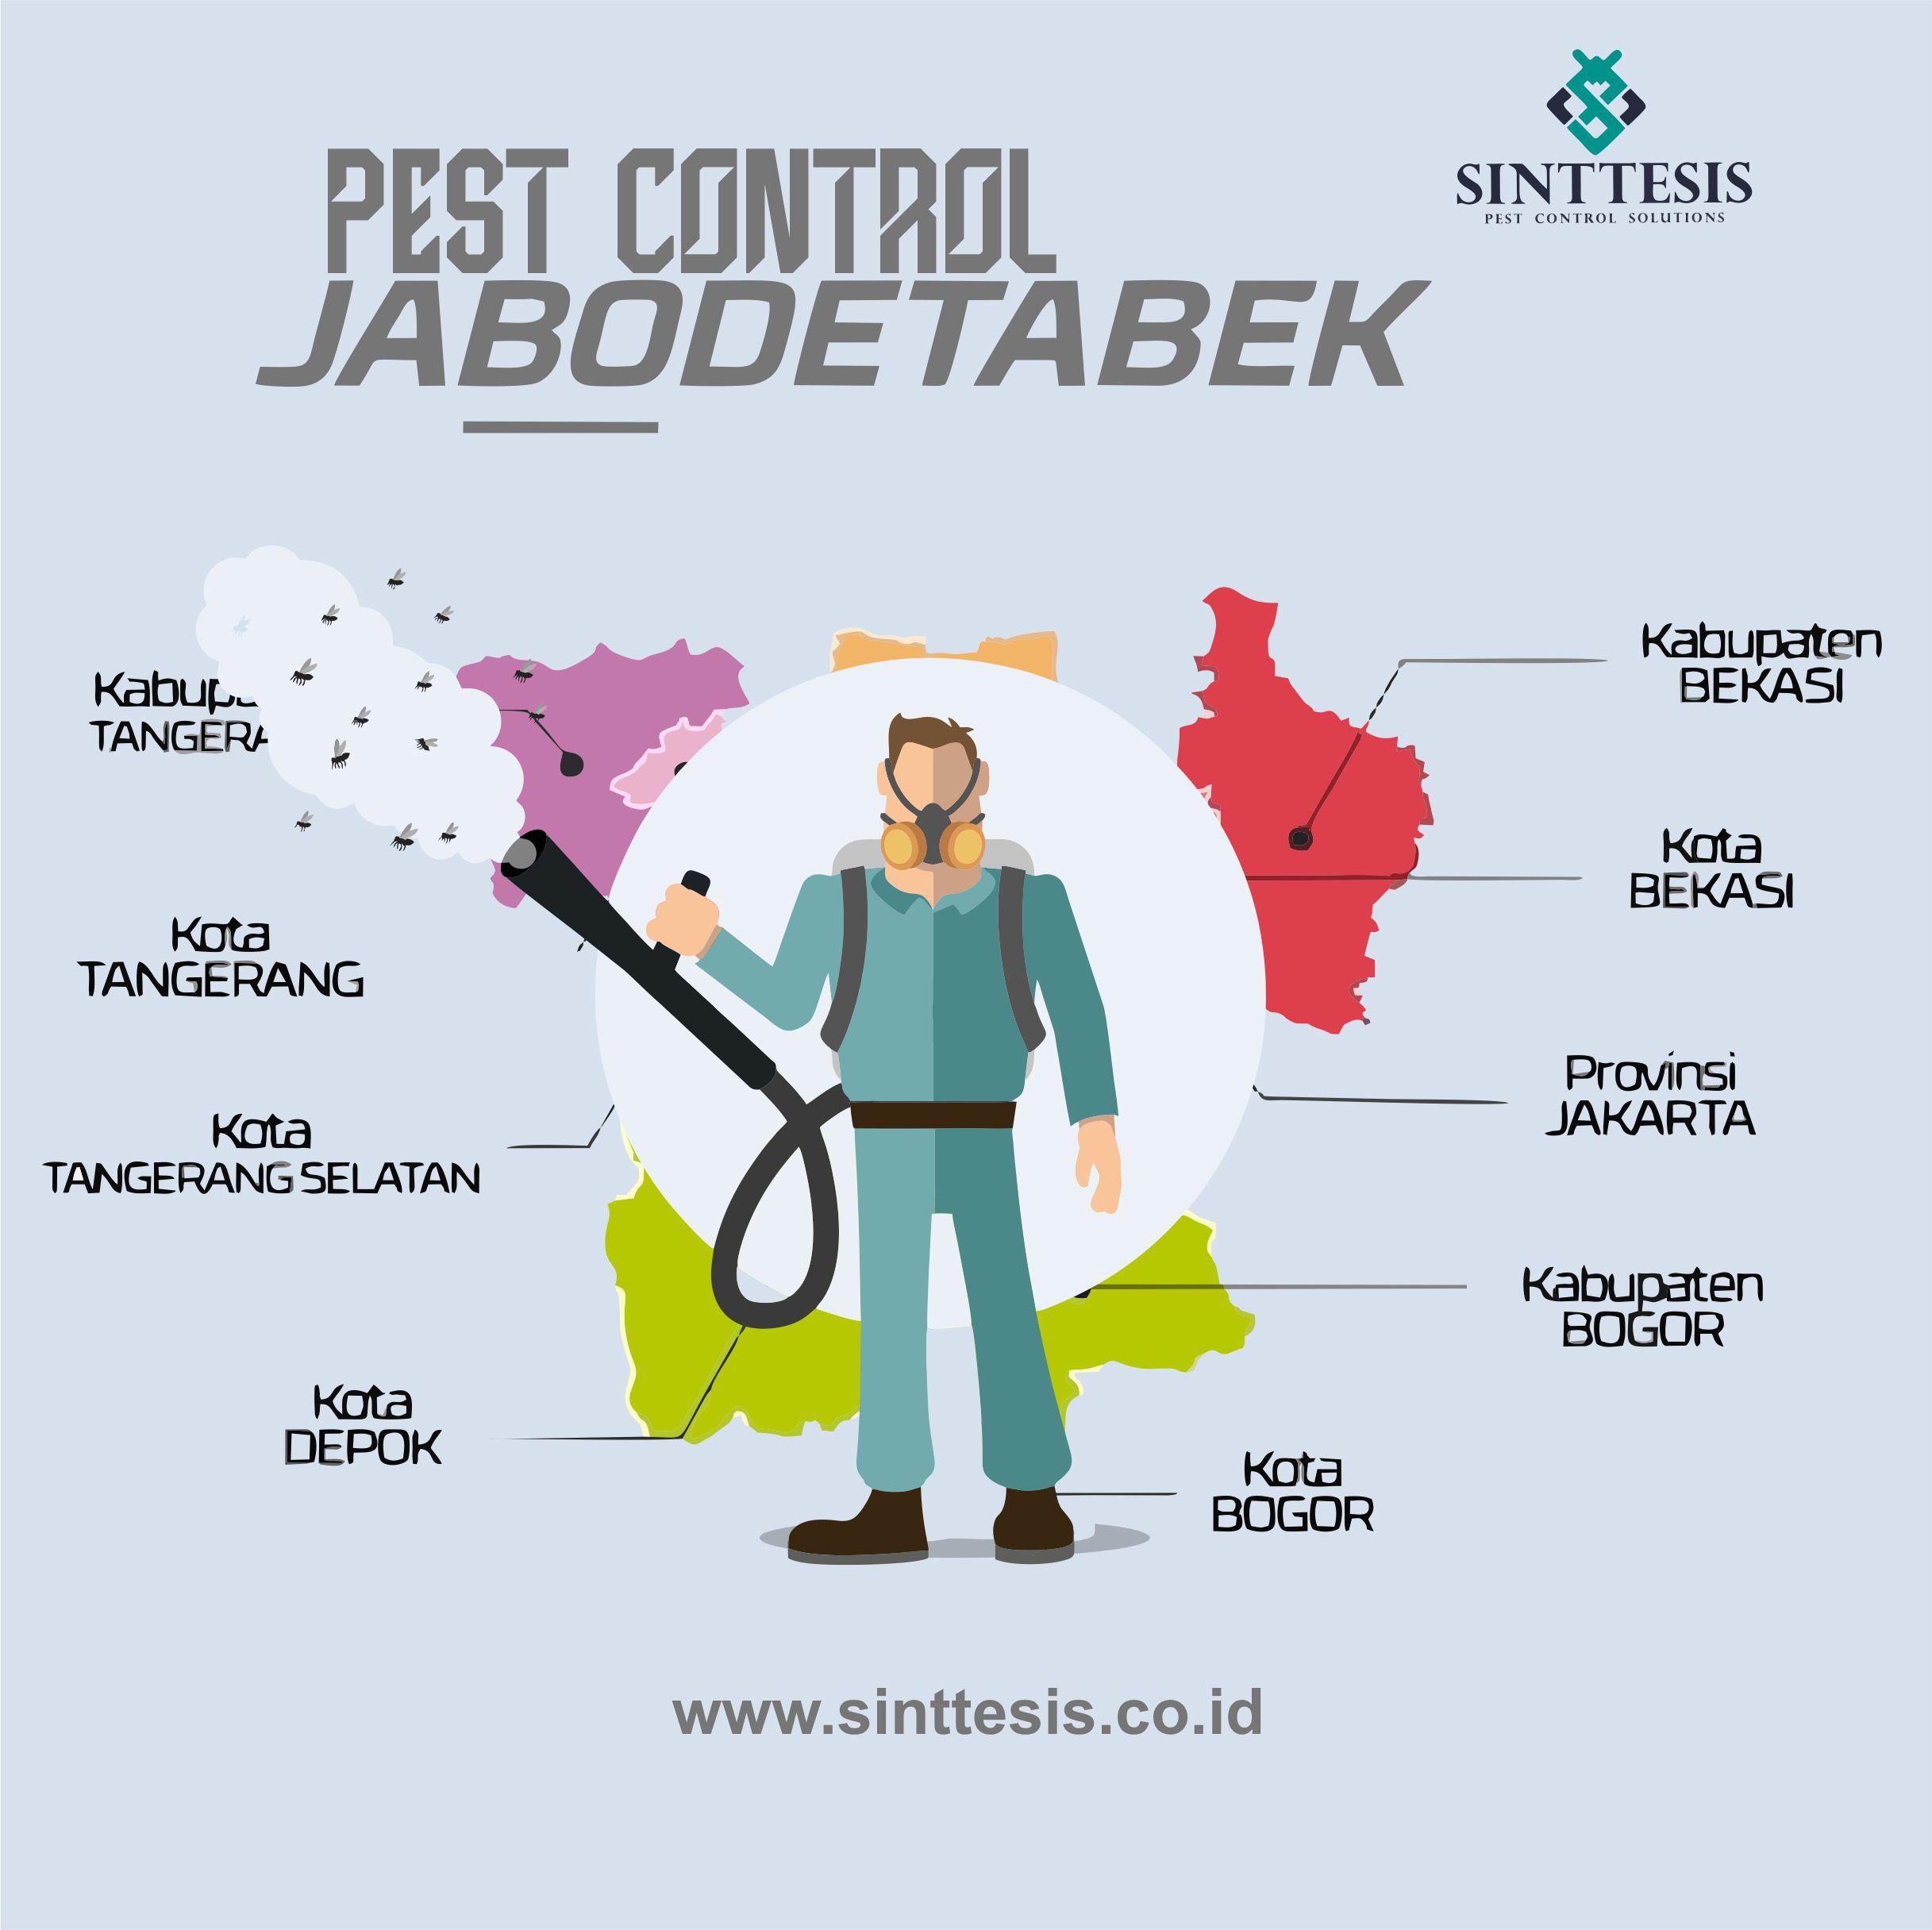 Perusahaan Pest Control di Jabodetabek dan Sukabumi